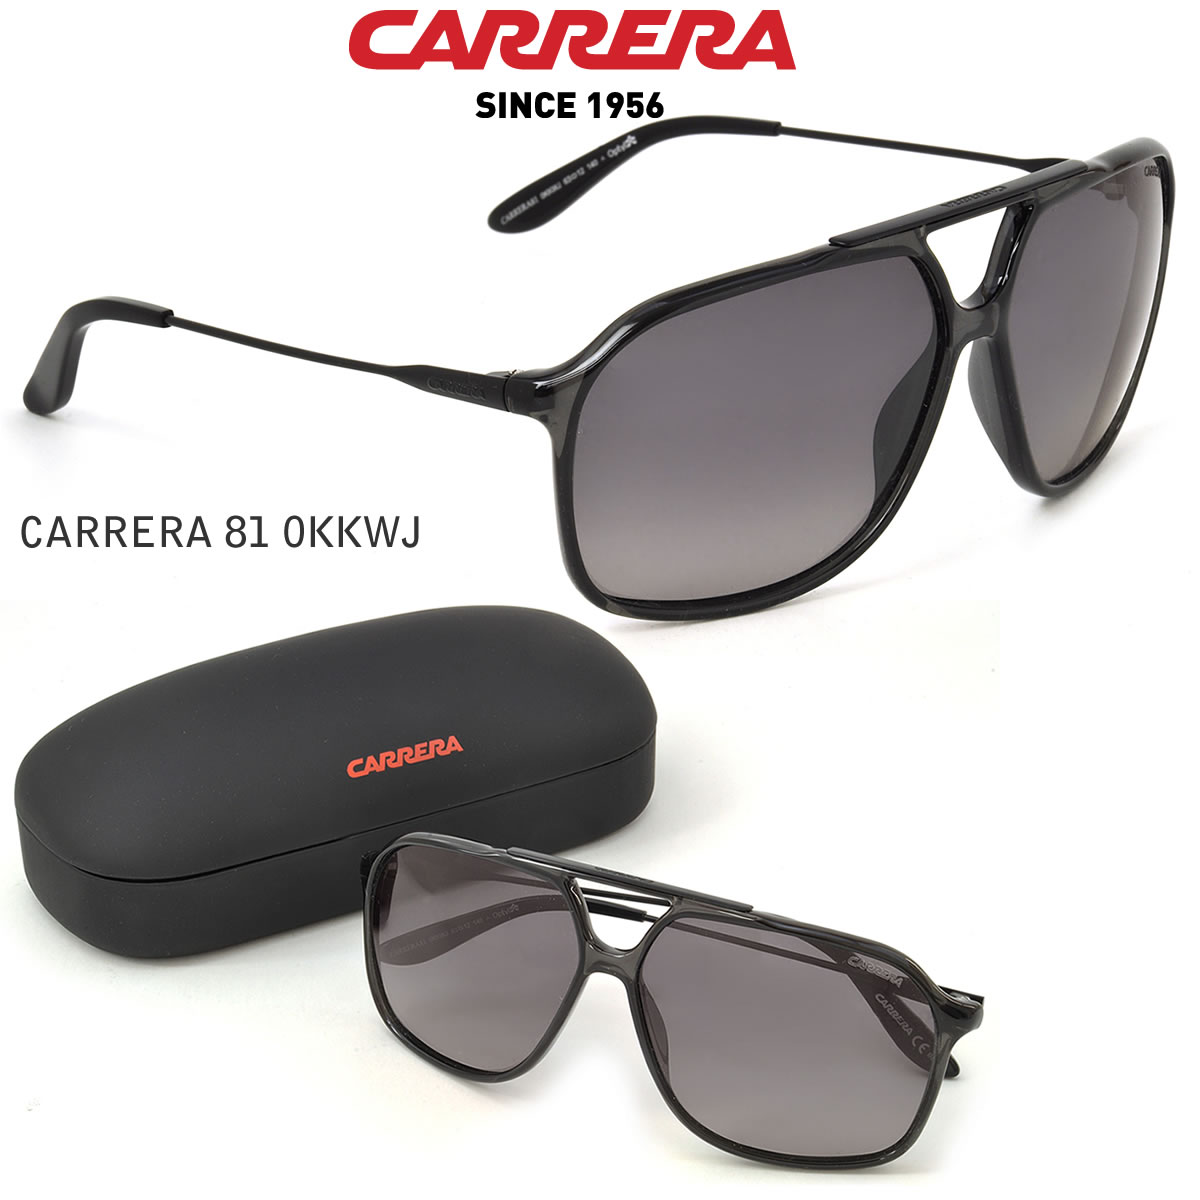 CARRERA 81 0KKWJ偏光型号